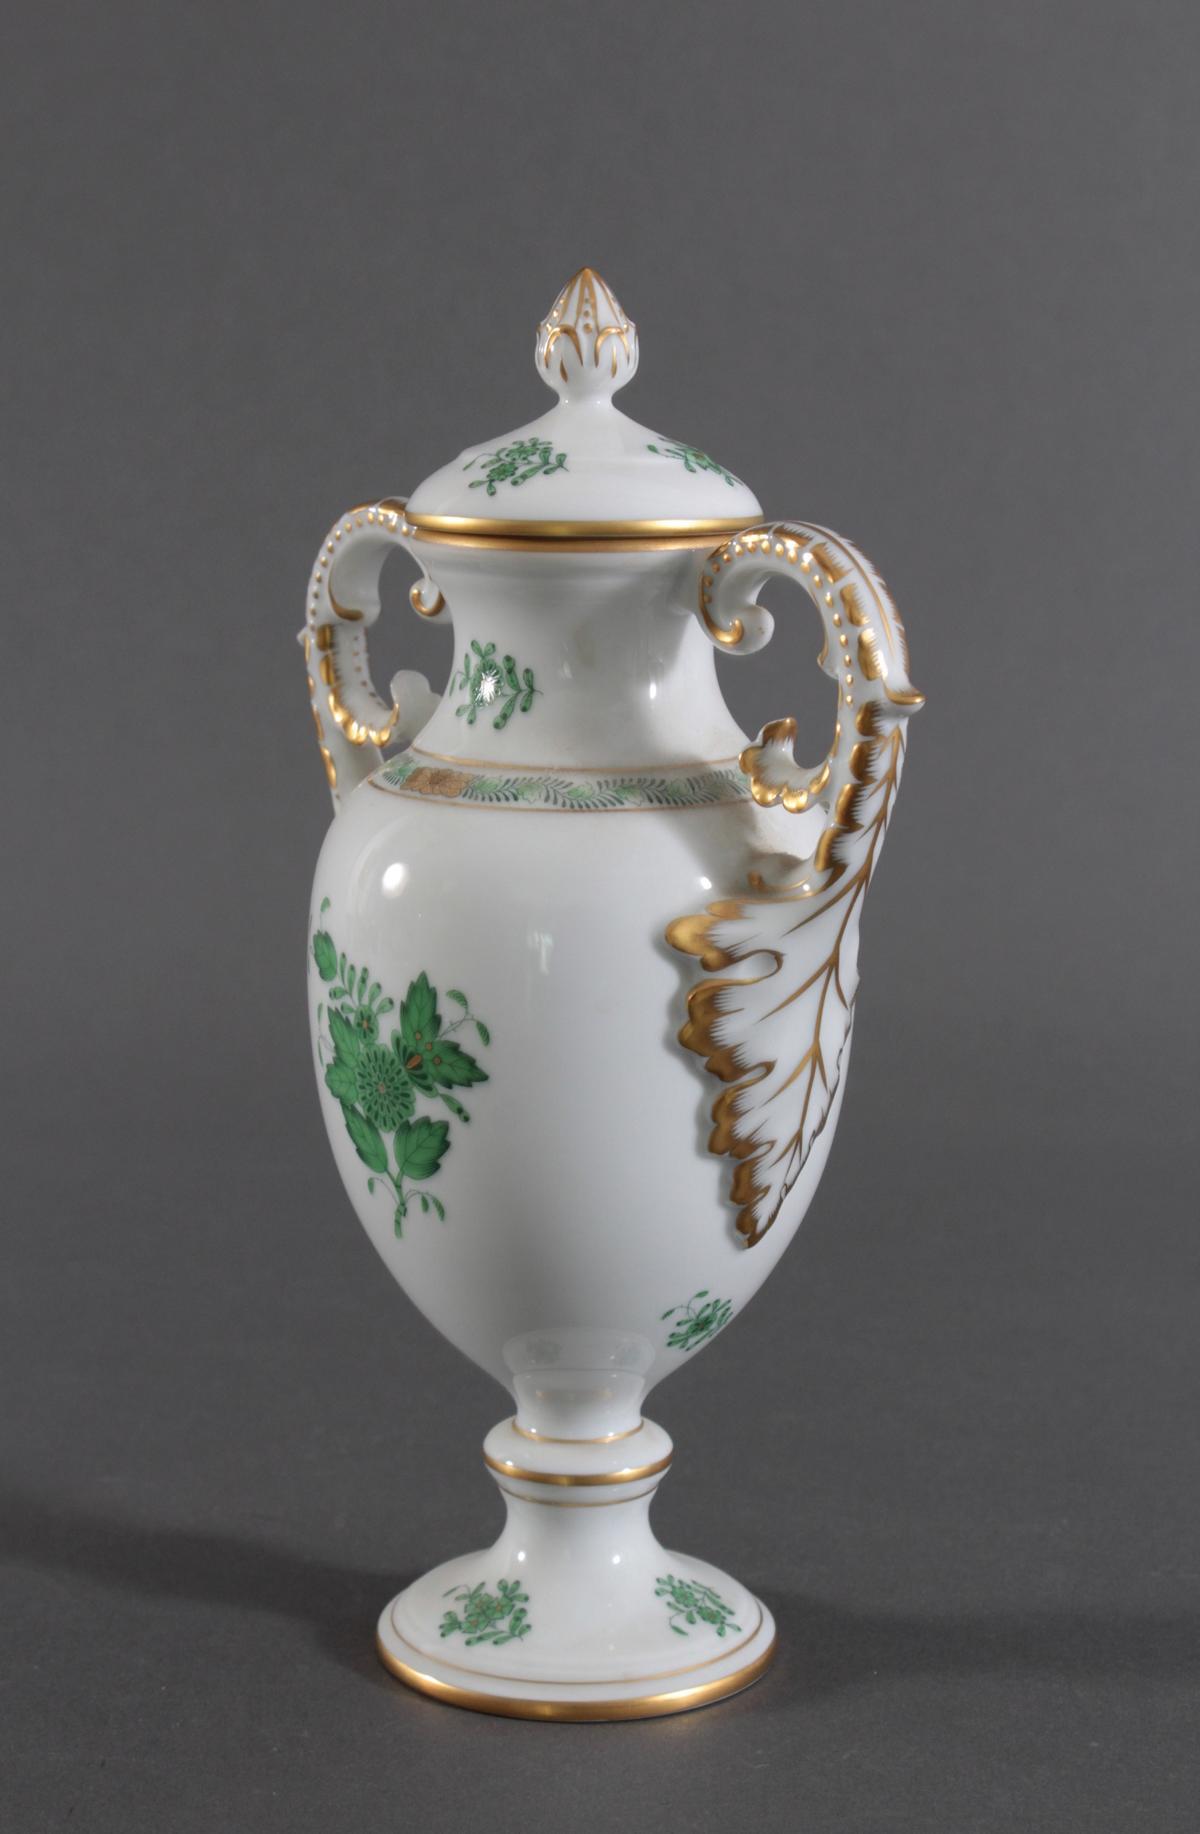 Amphorenvase Herend im Dekor Appony grün-2